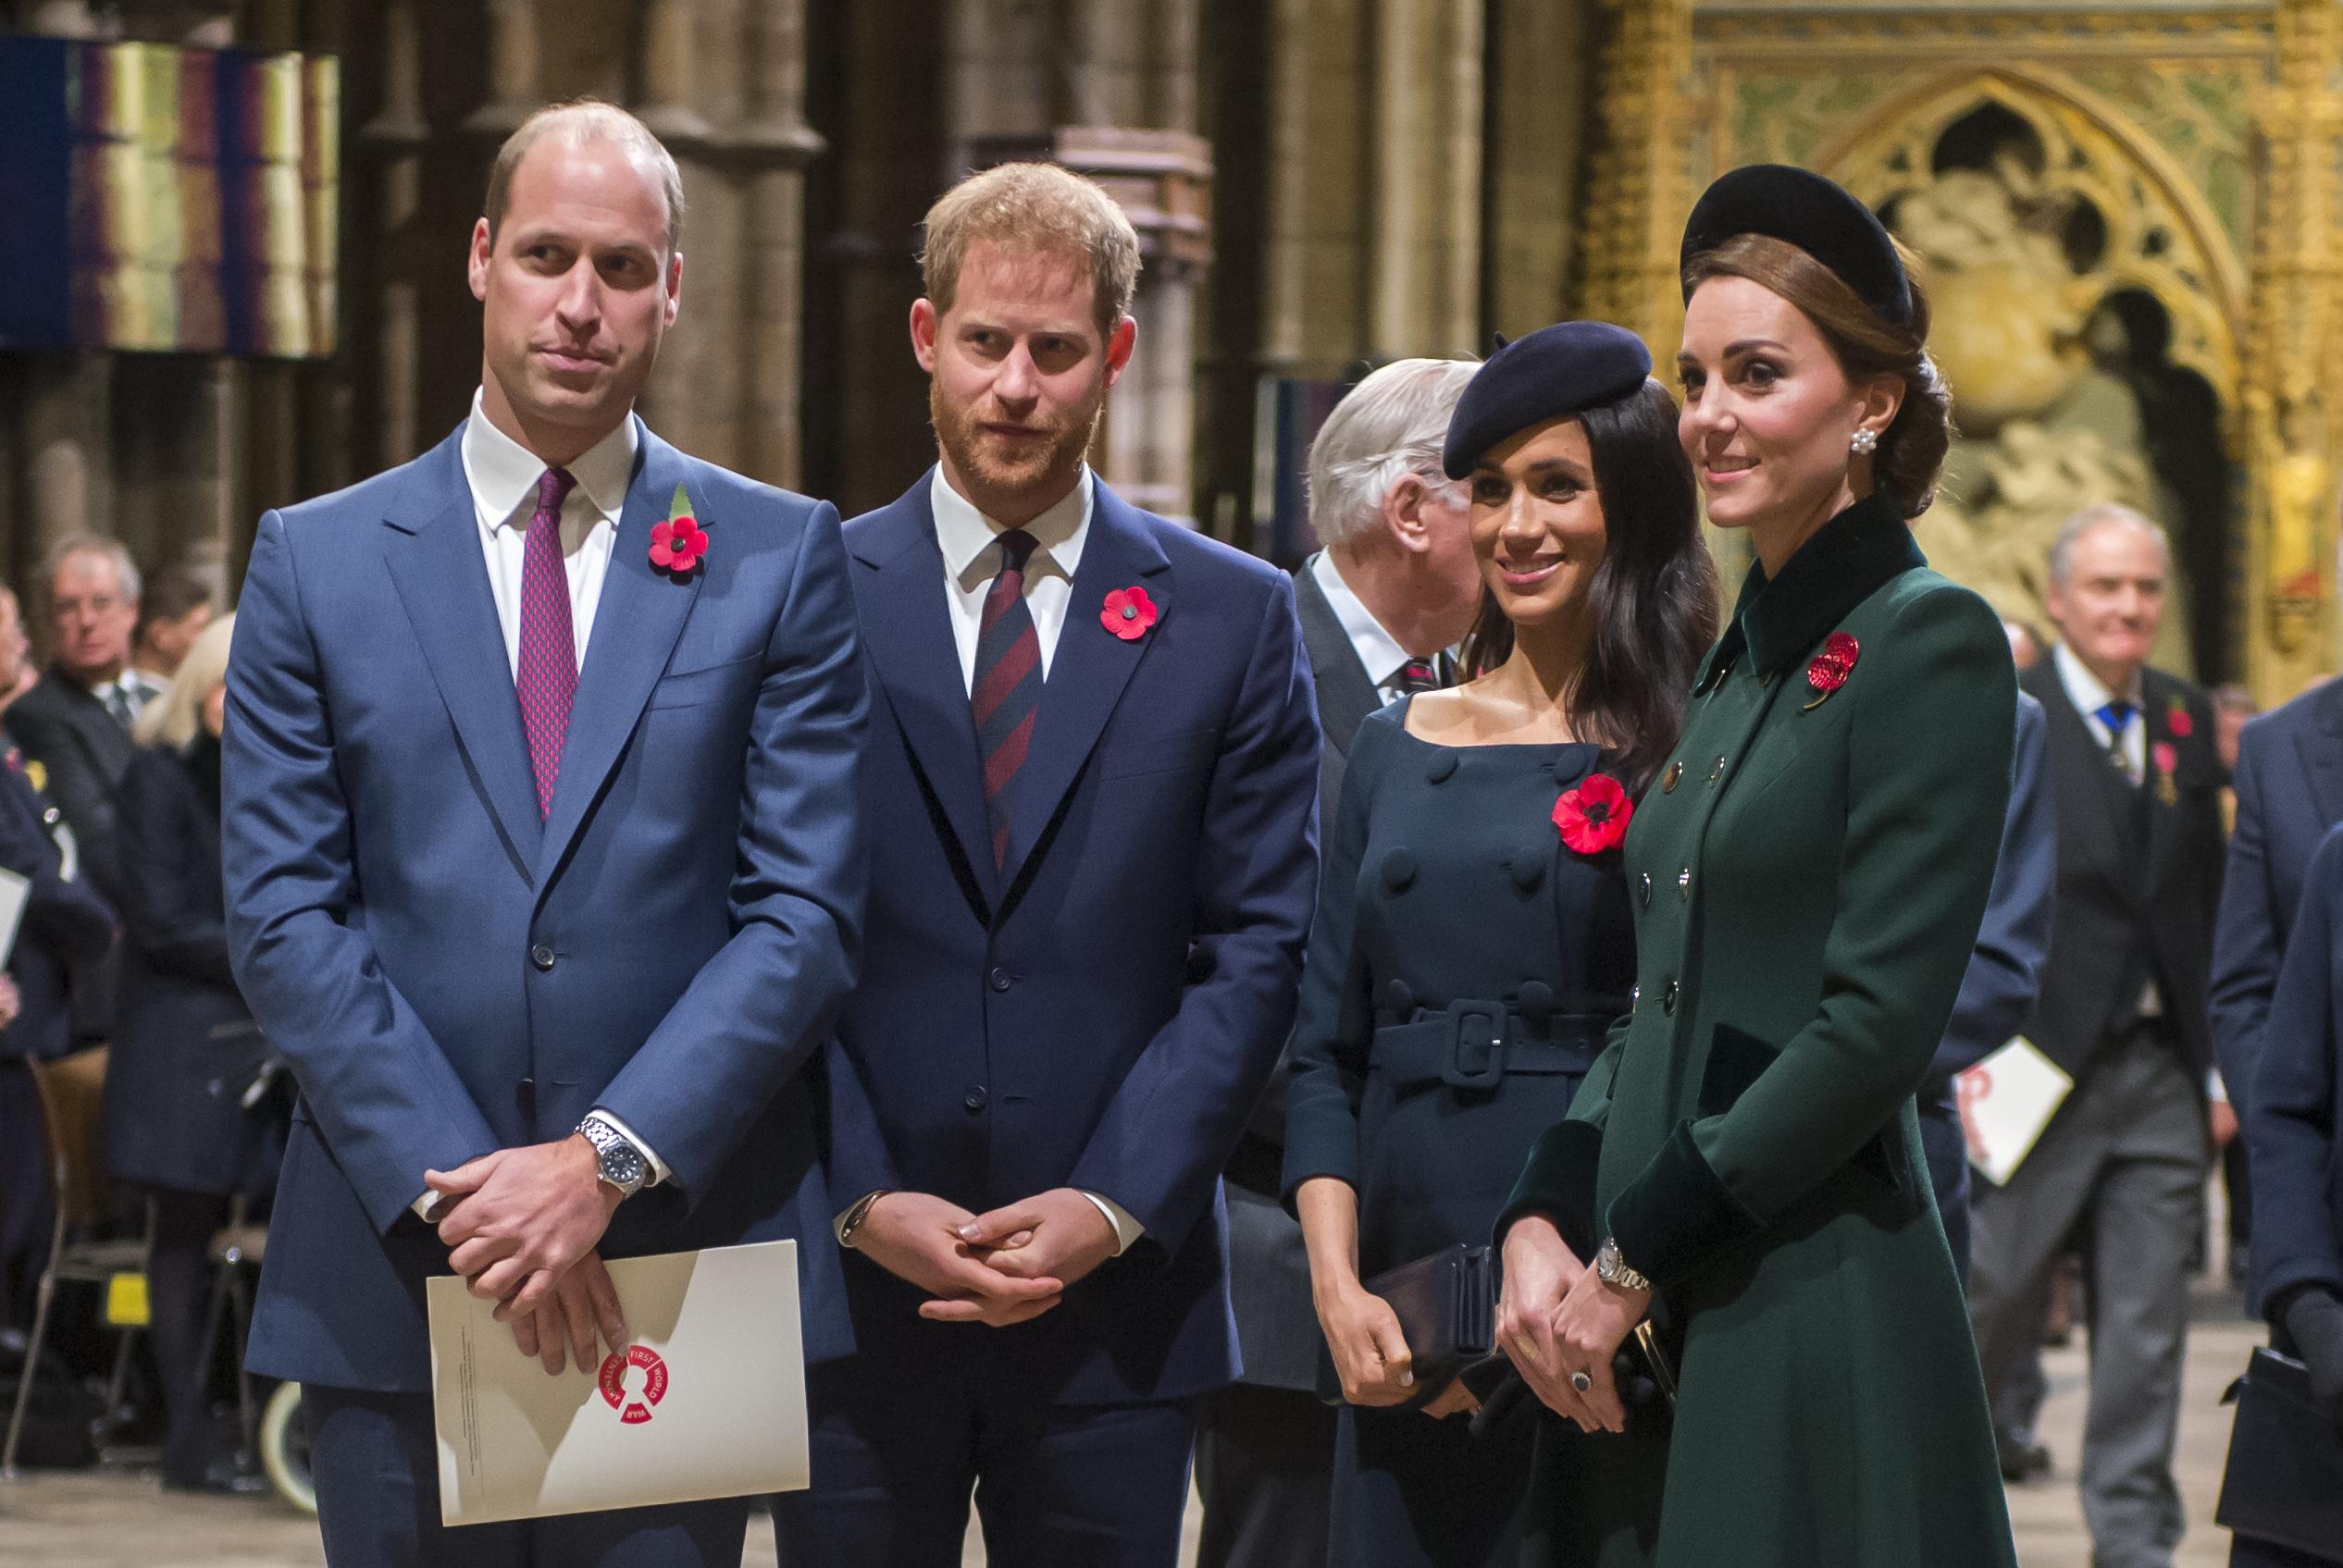 Principe William, Principe Harry, Meghan Markle, Kate Middleton